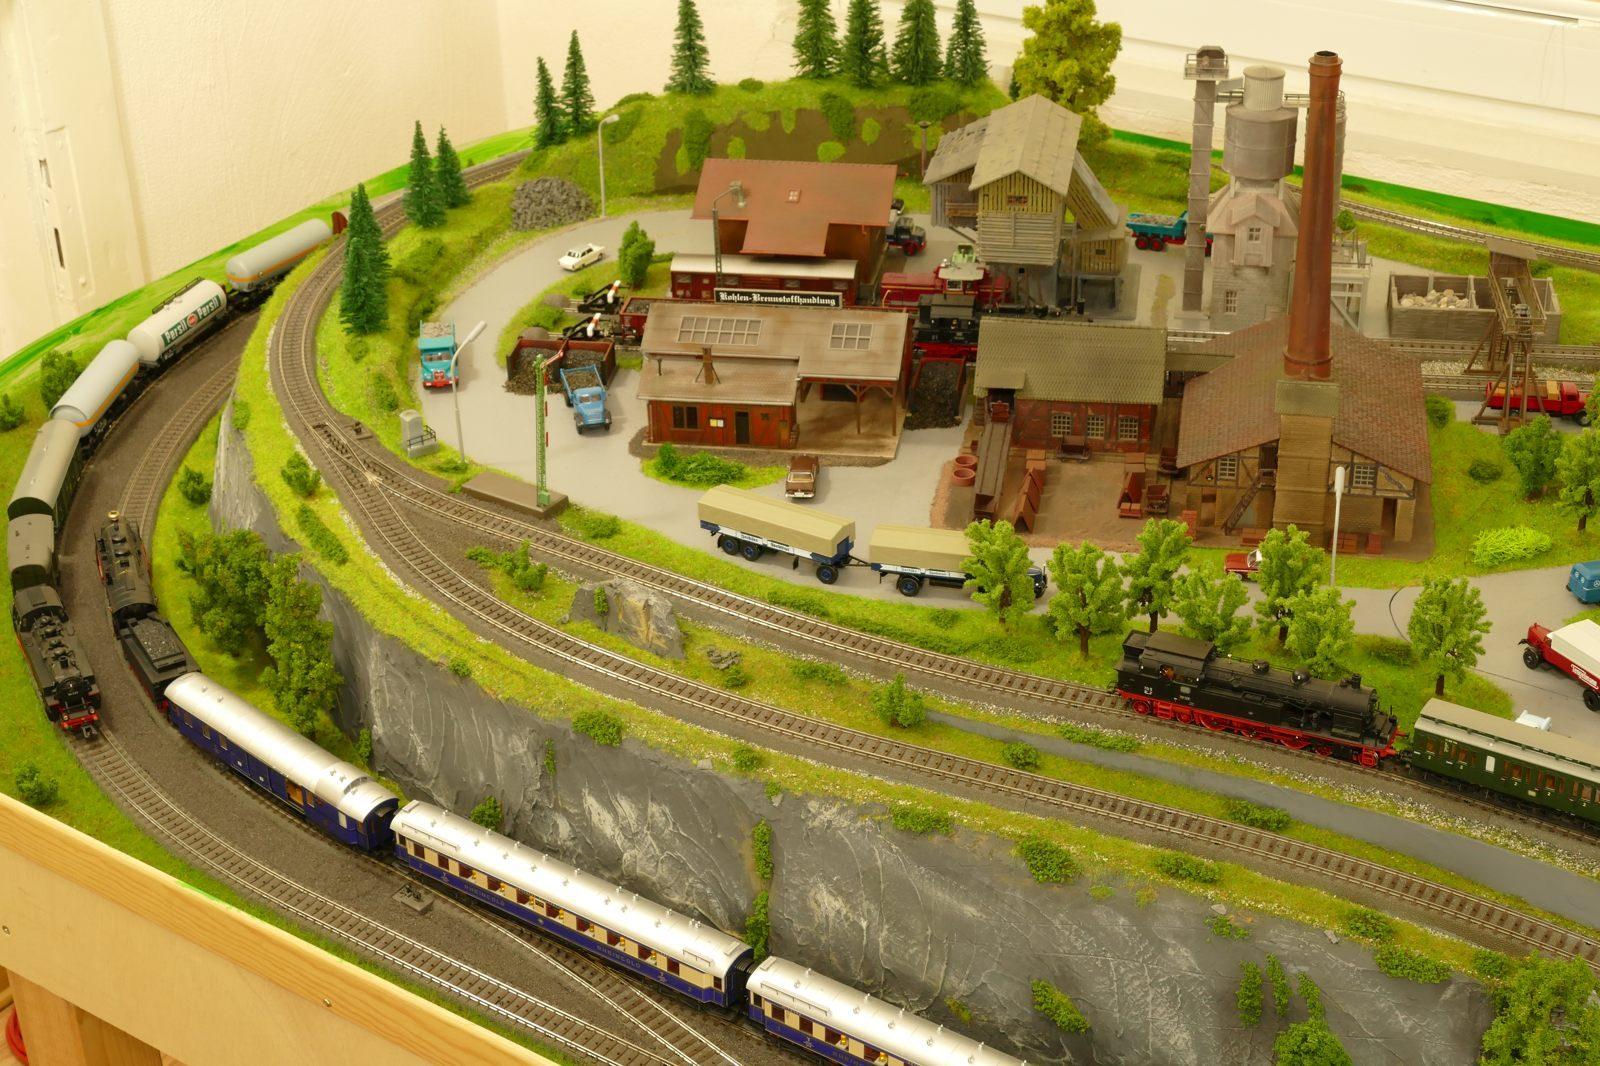 Kohlenhandlung, Ziegelei, Lagerhaus, Betonmischwerk